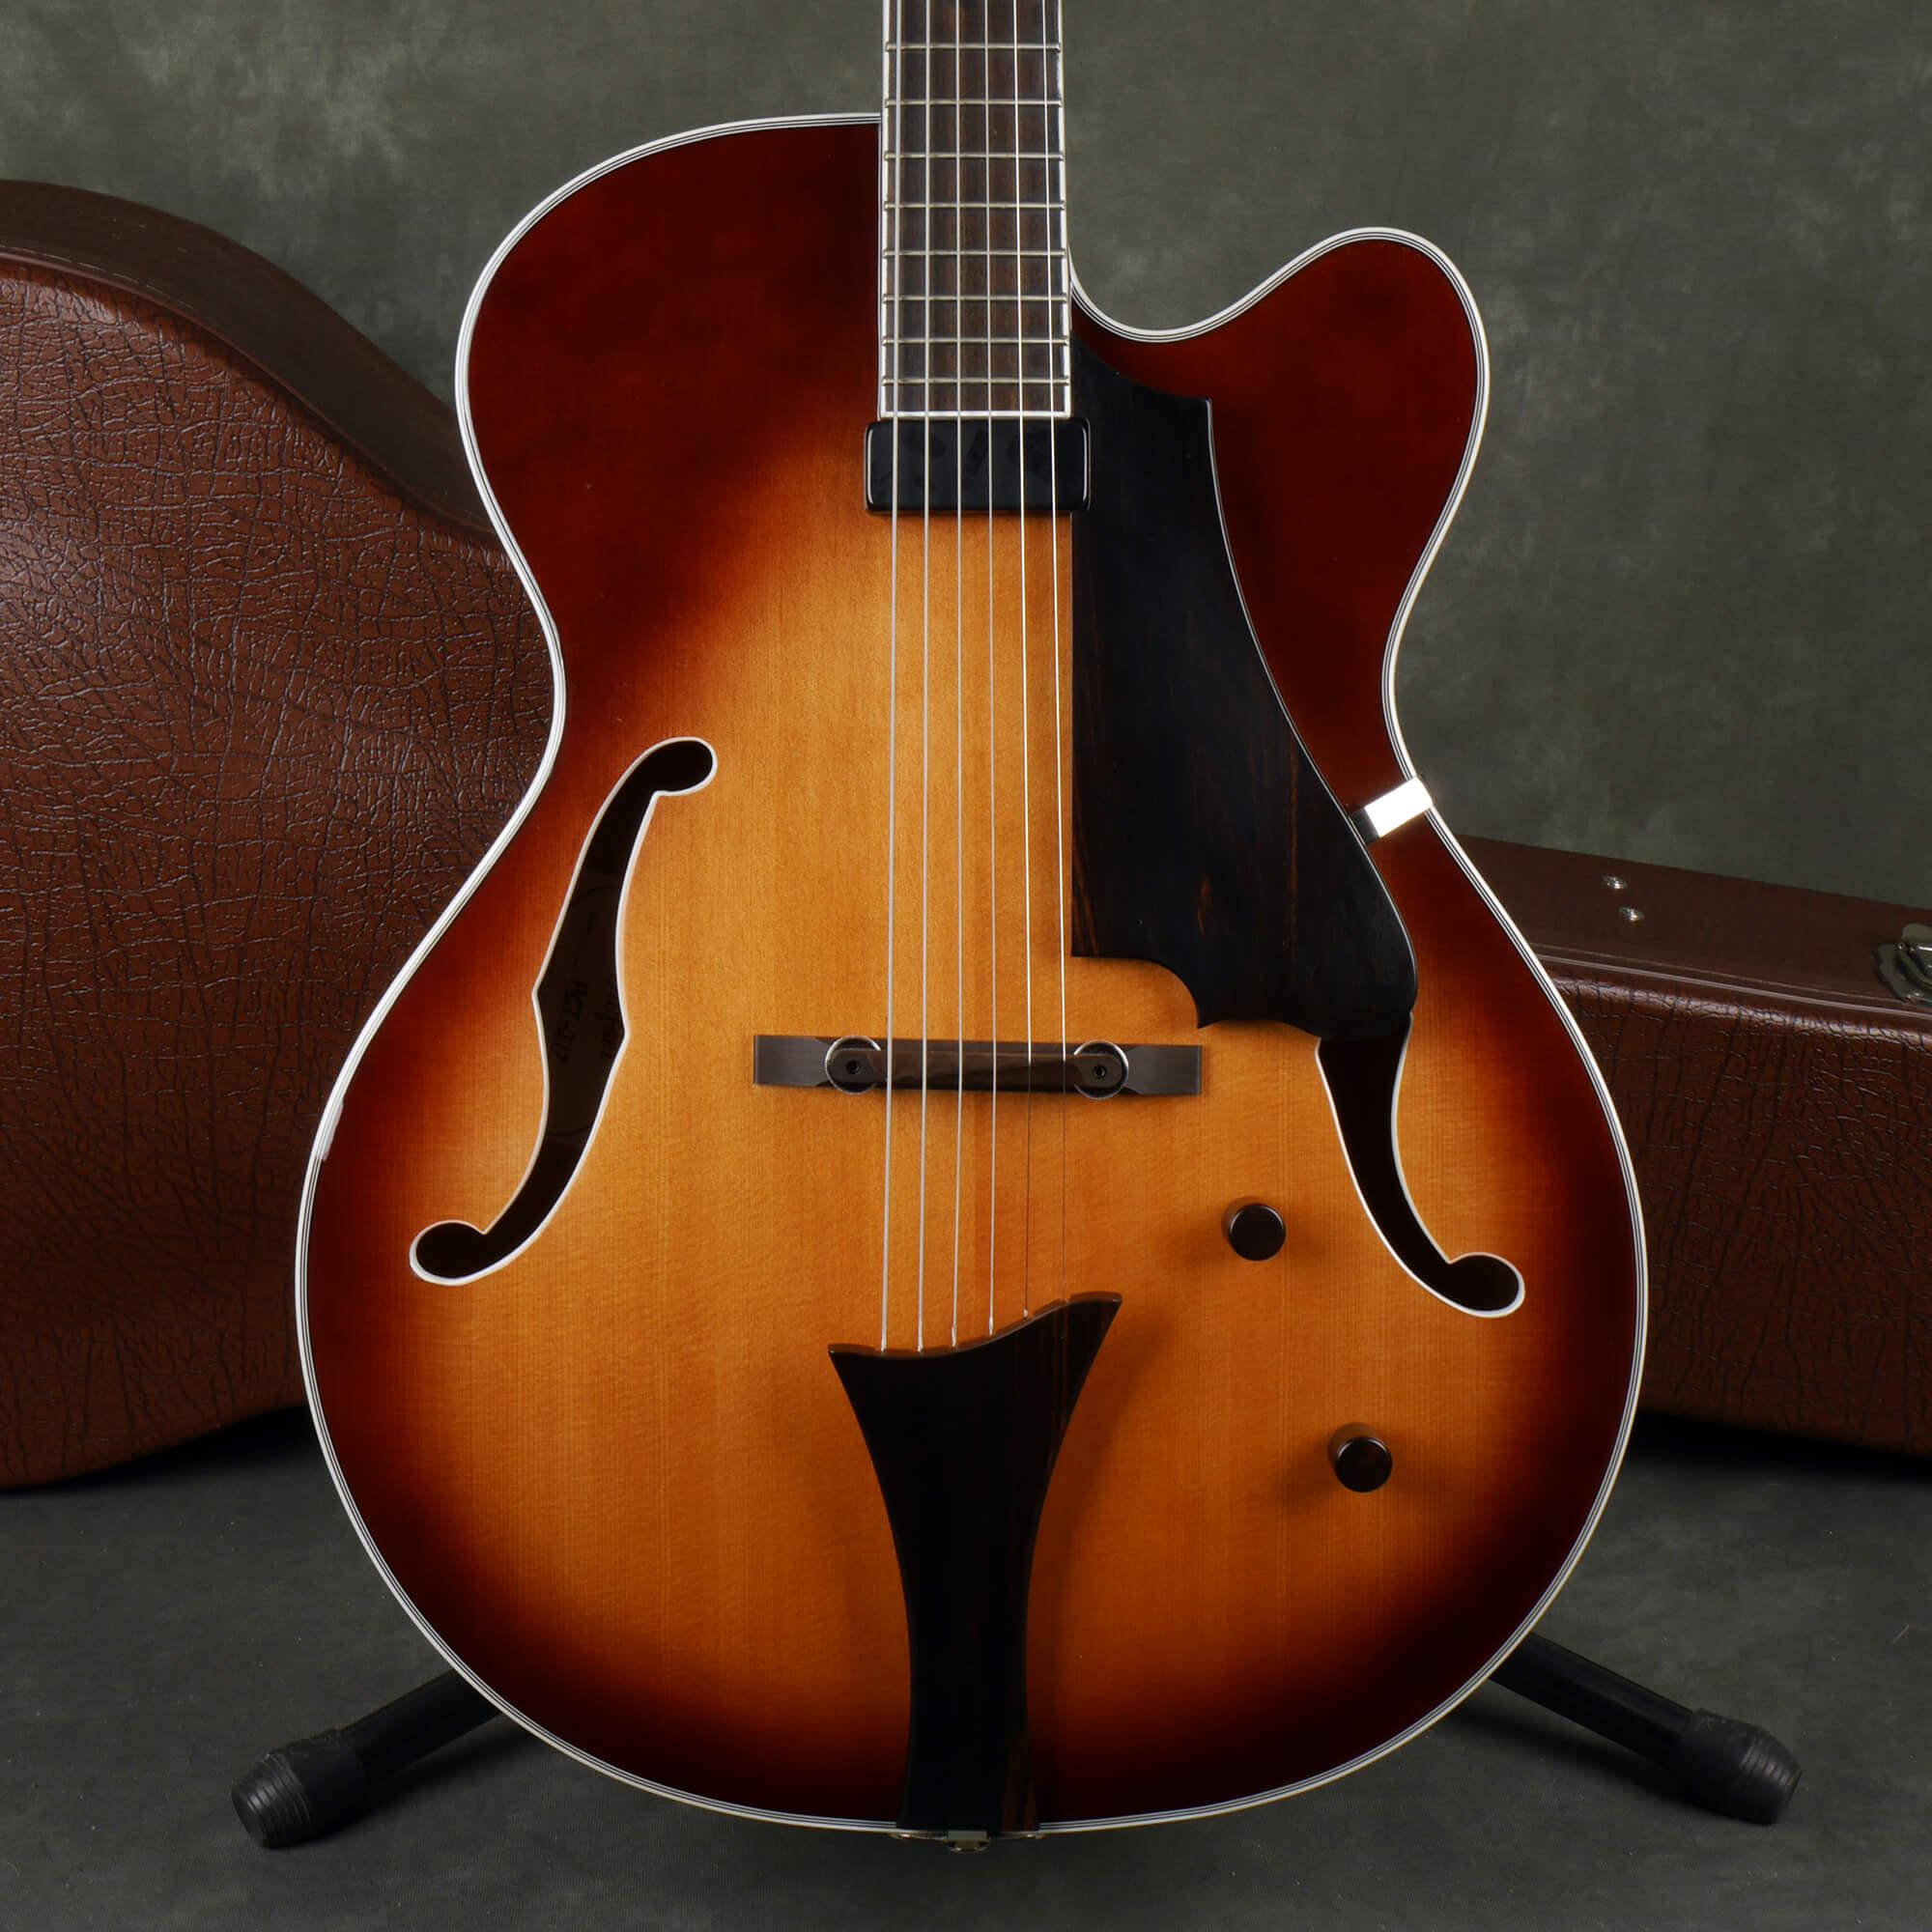 Hofner HCT-J17 Jazz Archtop Guitar - Vintage Sunburst w/Hard Case - 2nd Hand